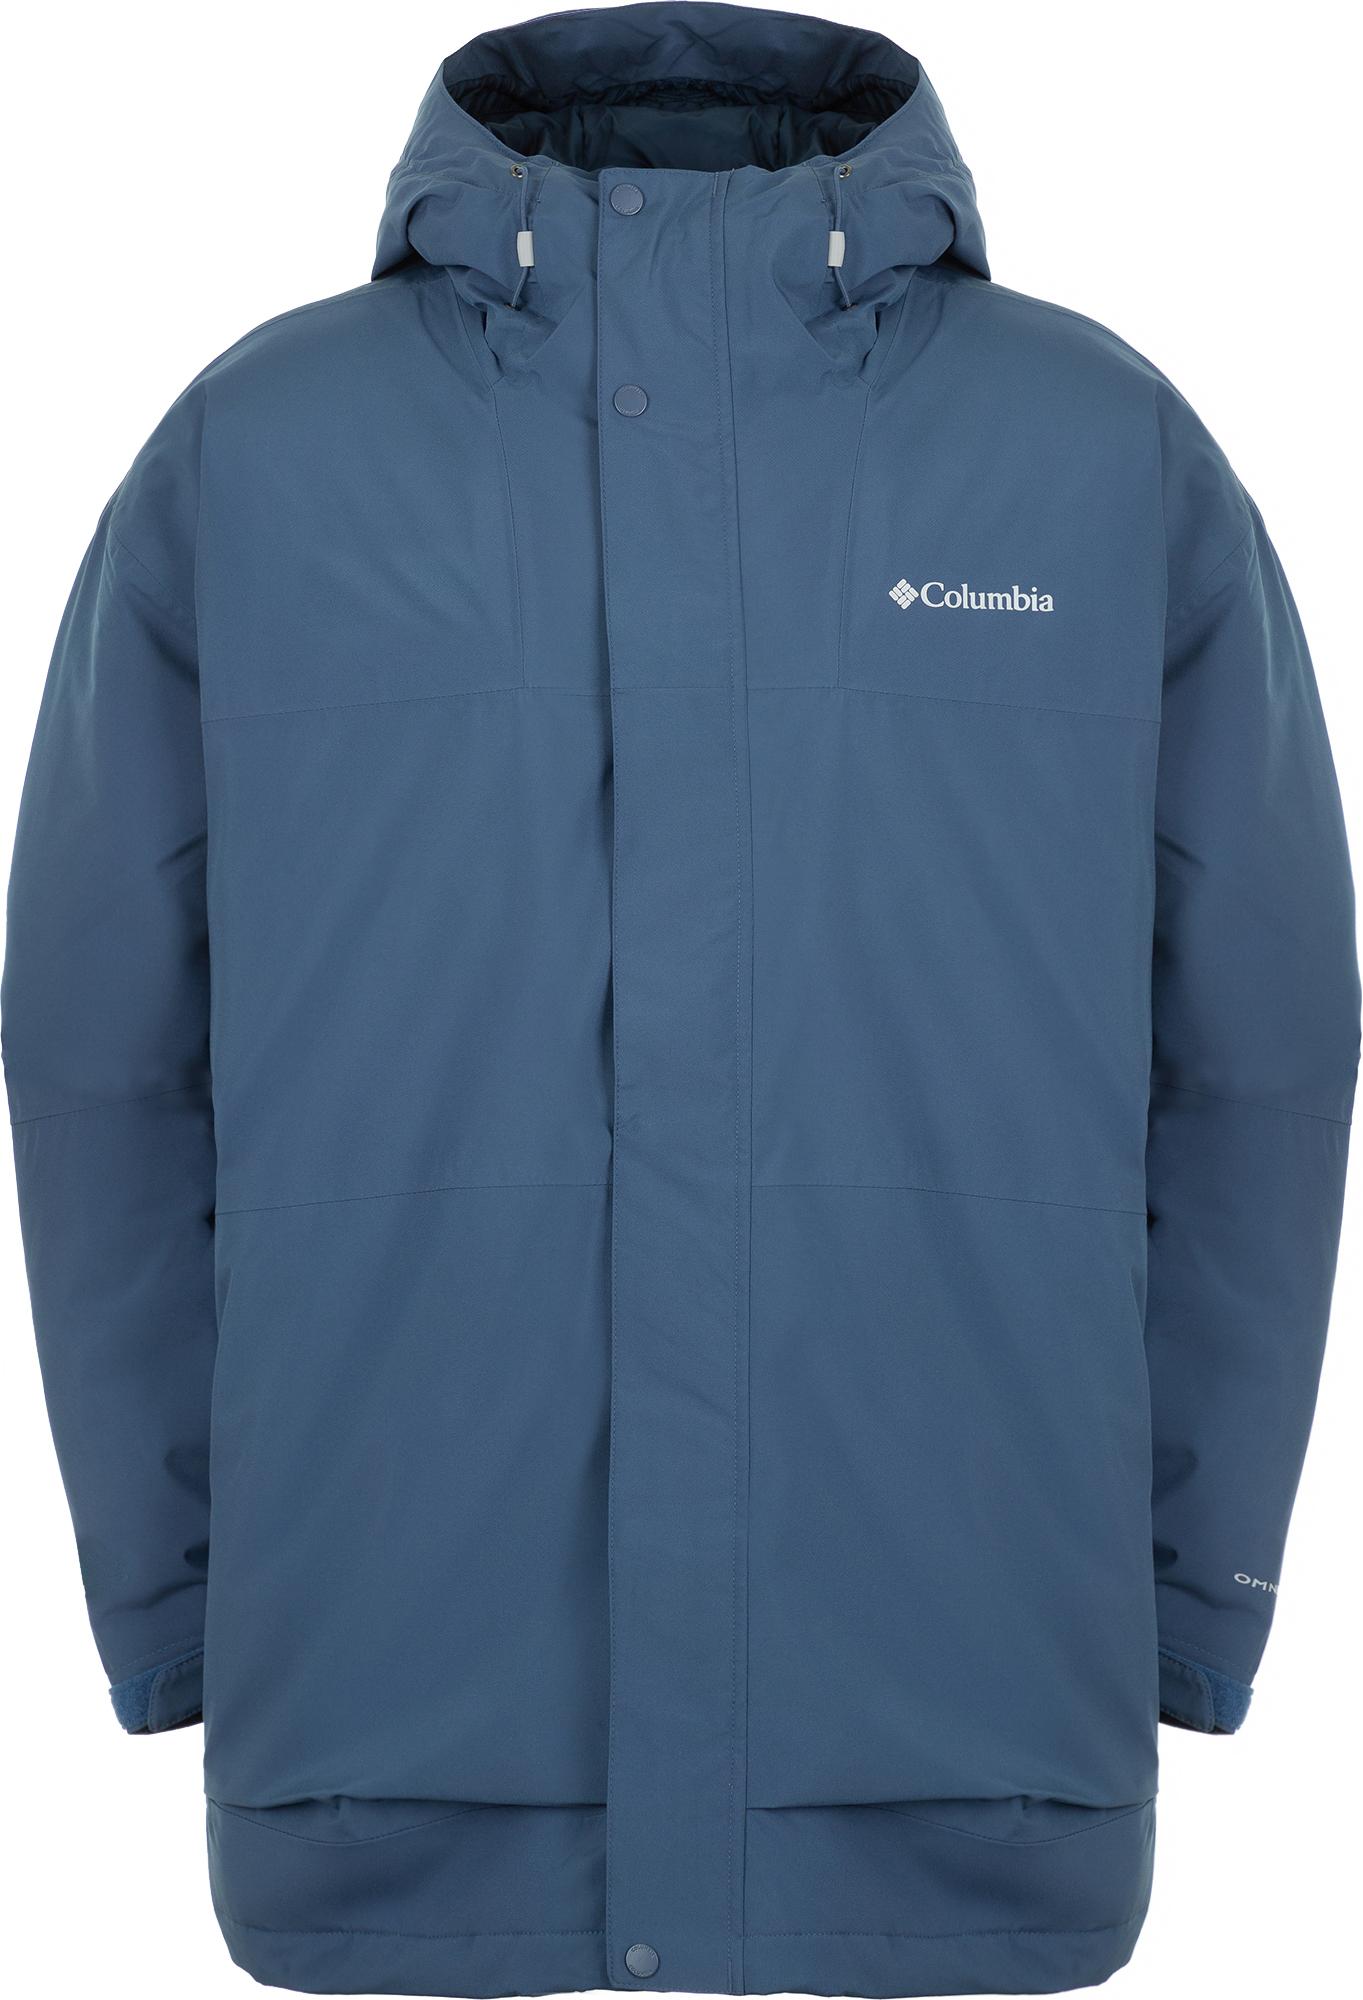 Columbia Куртка утепленная мужская Columbia Horizon Explorer, размер 60-62 цена и фото